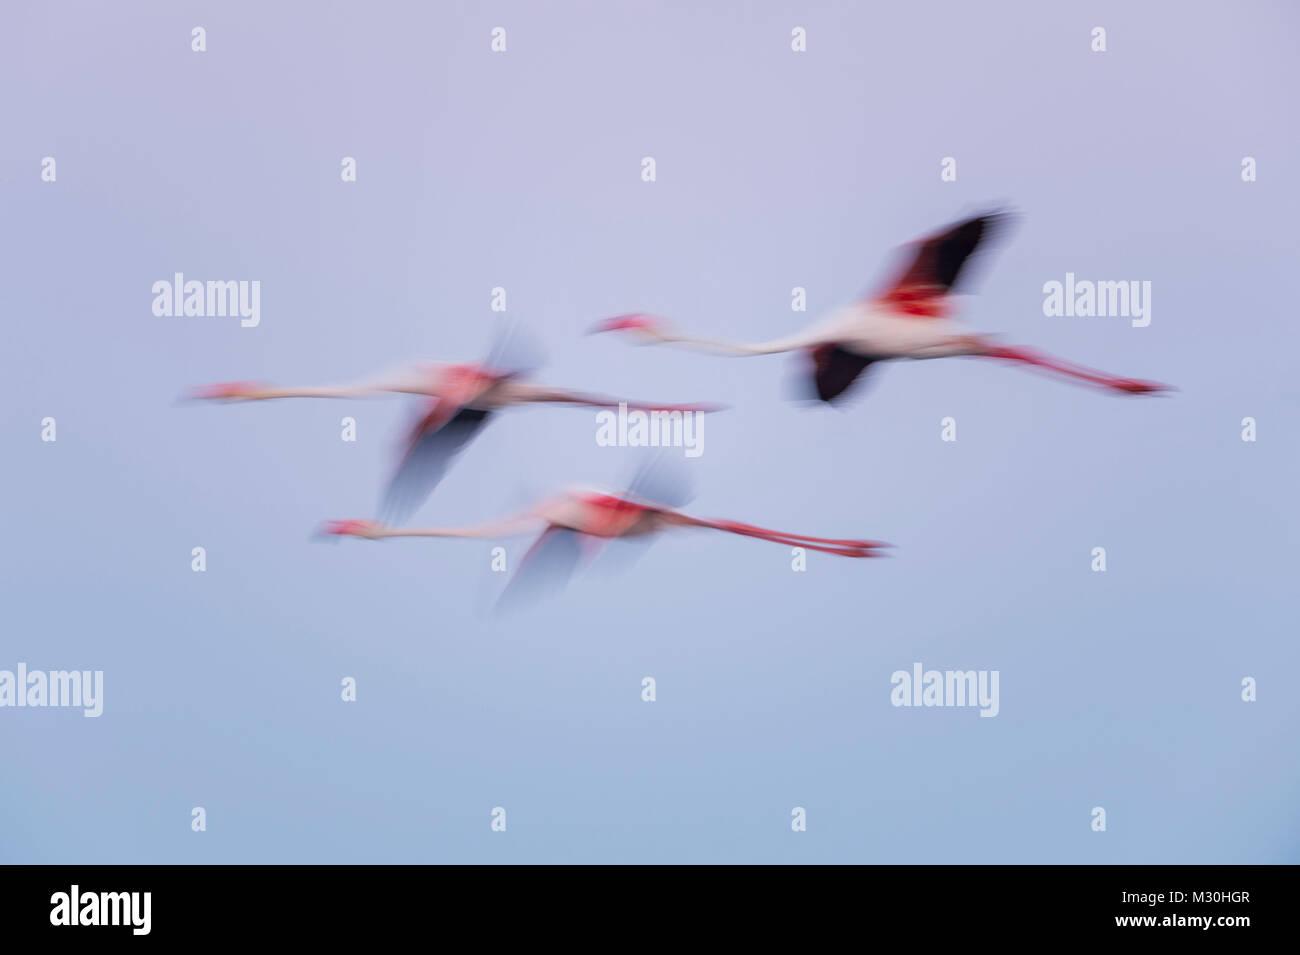 European Flamingo, Great Flamingo, Phoenicopterus roseus, at Dawn in Flight, Long Exposure, Saintes-Maries-de-la - Stock Image